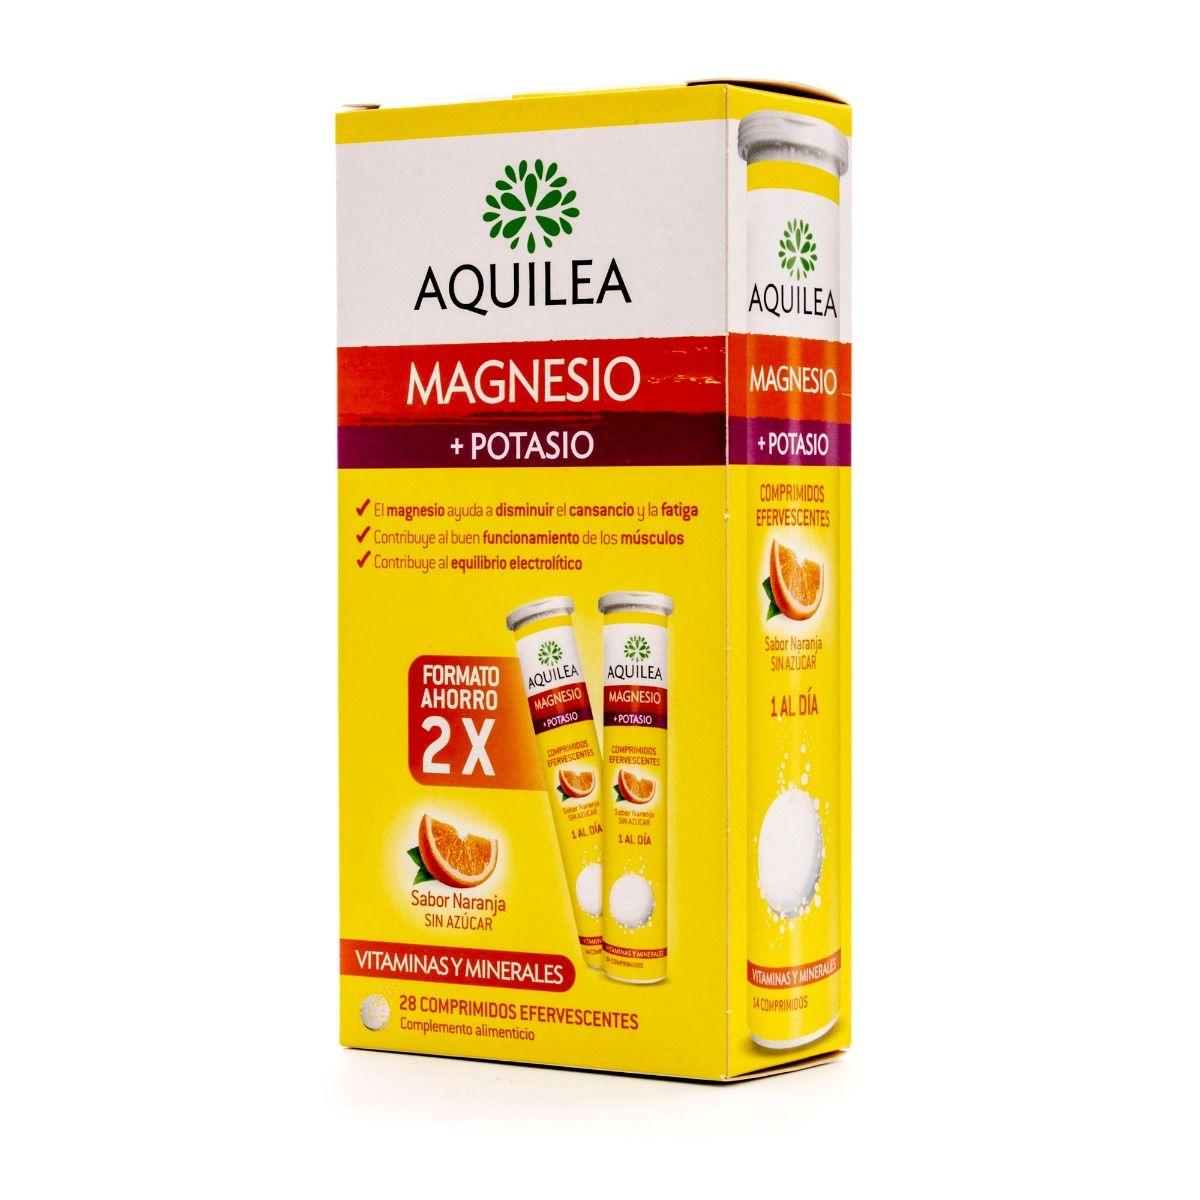 AQUILEA MAGNESIO + POTASIO 28 COMPRIMIDOS EFERV.